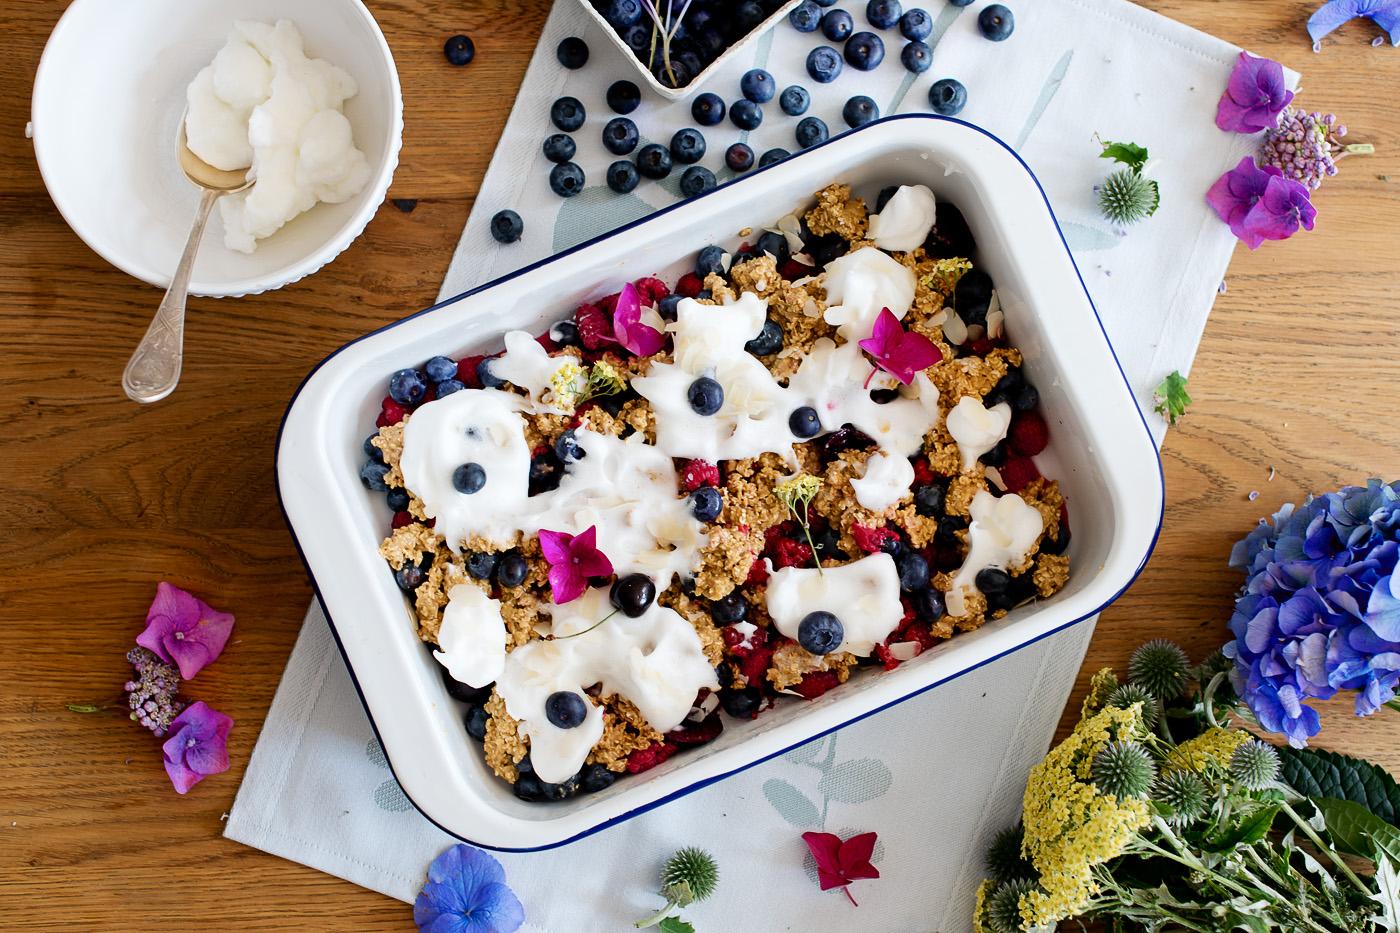 sommerbeeren-gratin-glutenfrei-laktosefrei-vegetarisch-foodblog